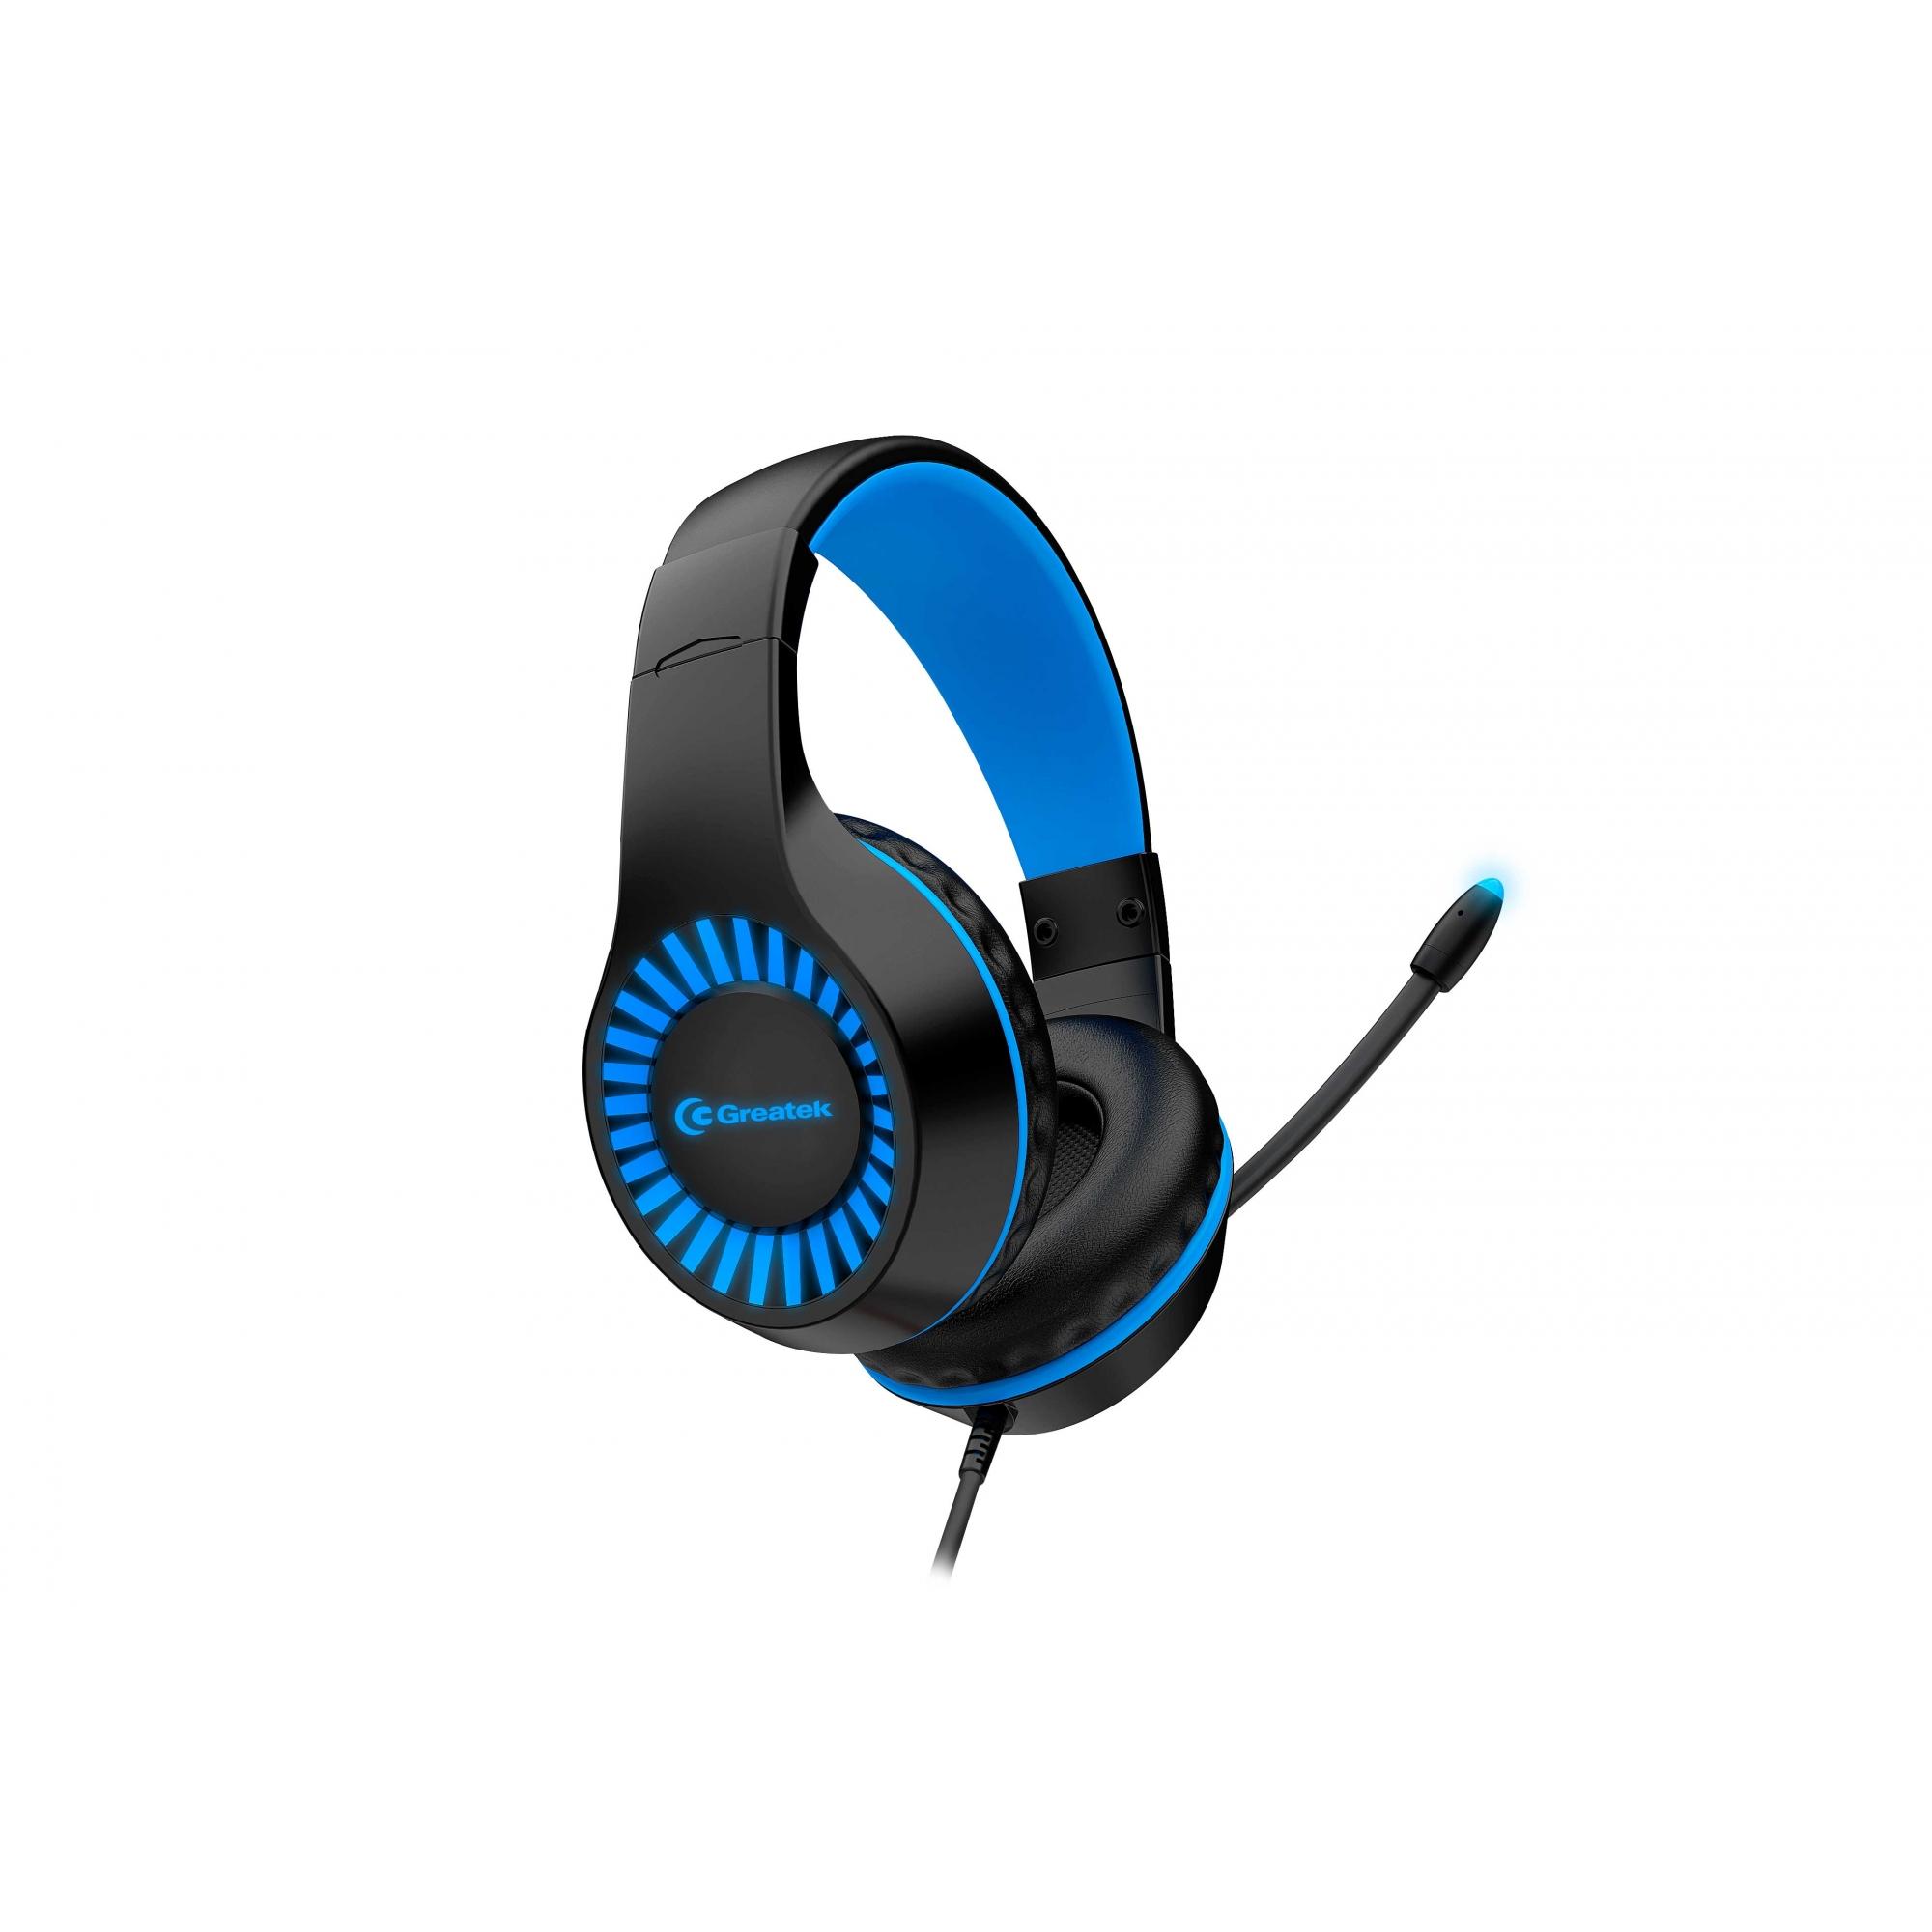 Headset Gamer Greatek Zeus c/Fio E Led Azul Ps4 Xbox Pc